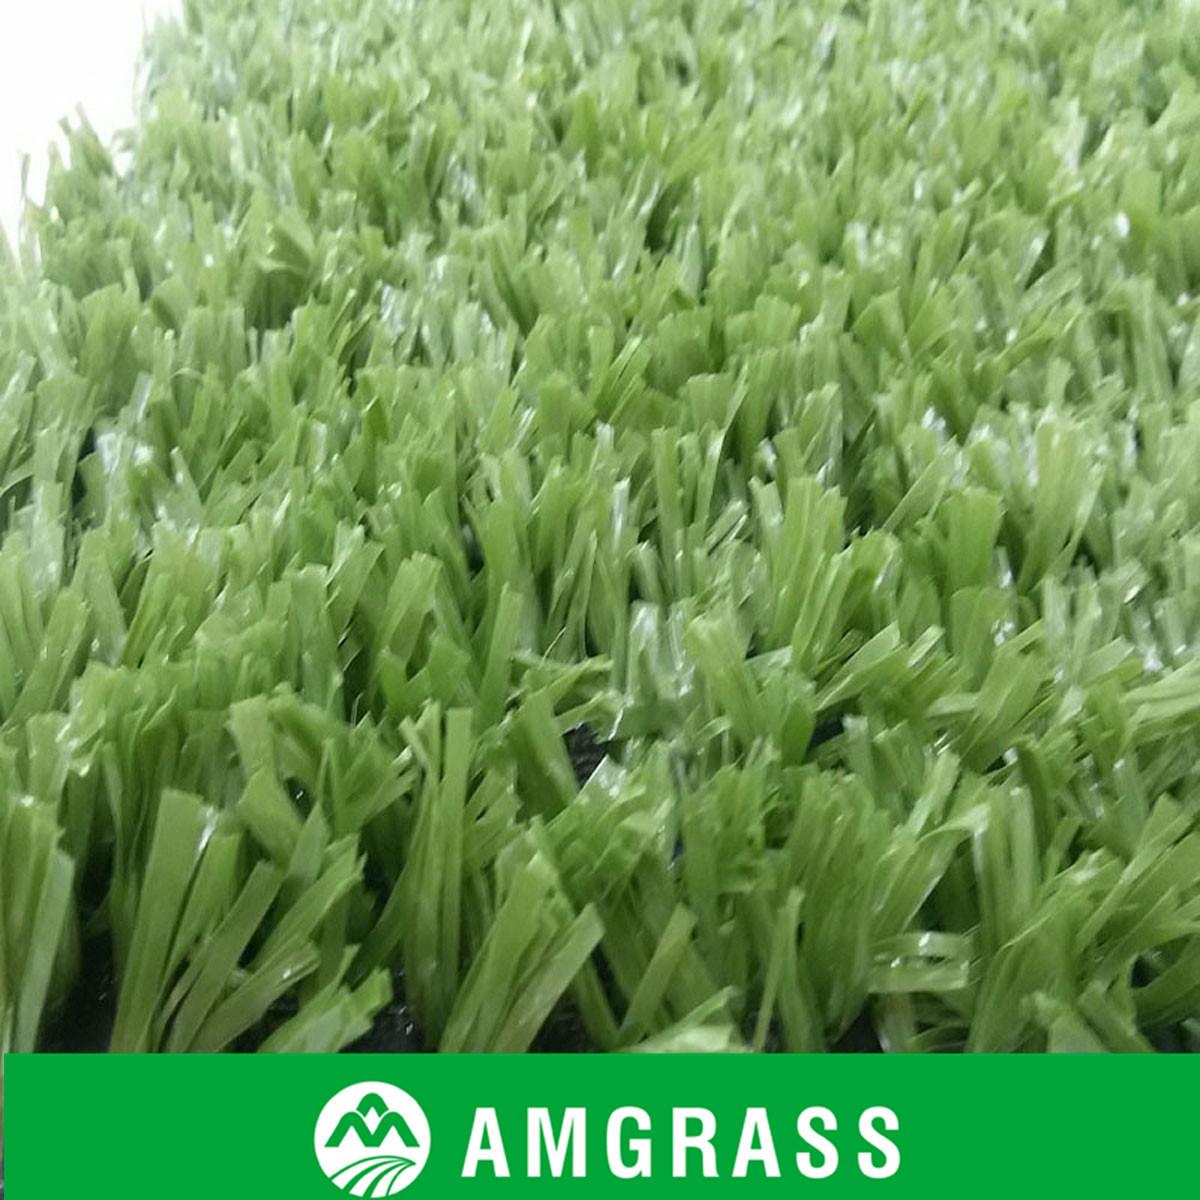 Cheap 50mm/60mm Soccer Artificial Grass, PE Fibrilated Yarn Football Turf